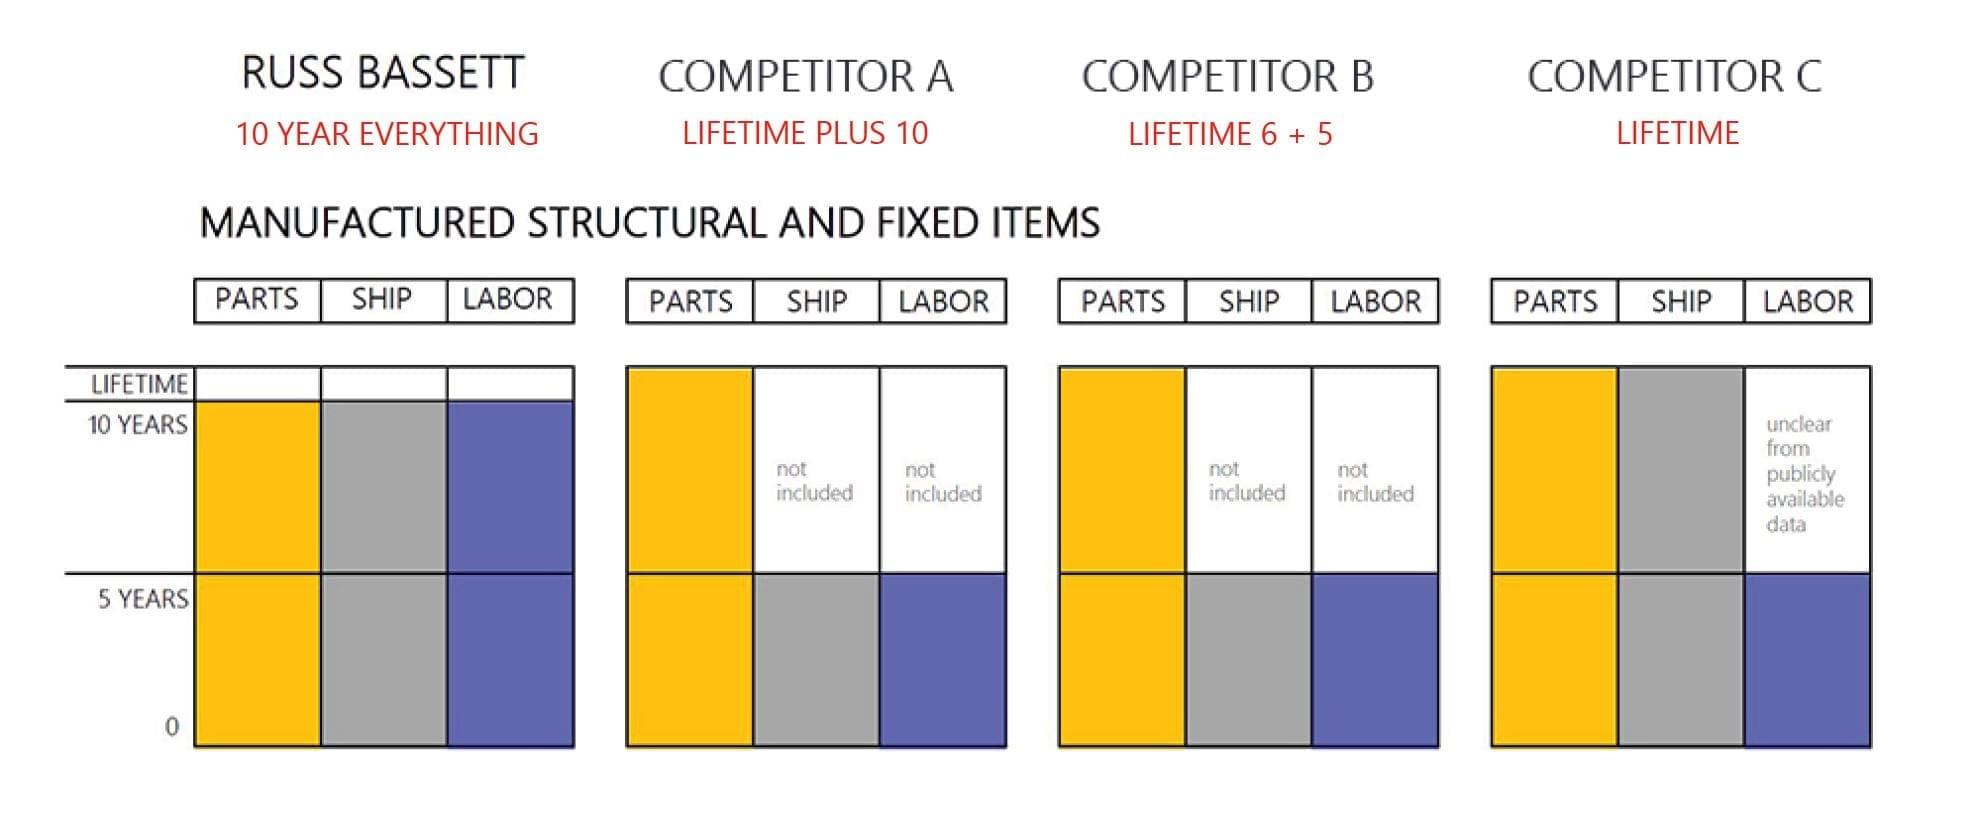 consoles-warranty-comparison-xybix-evans-watson-consoles-russ-bassett